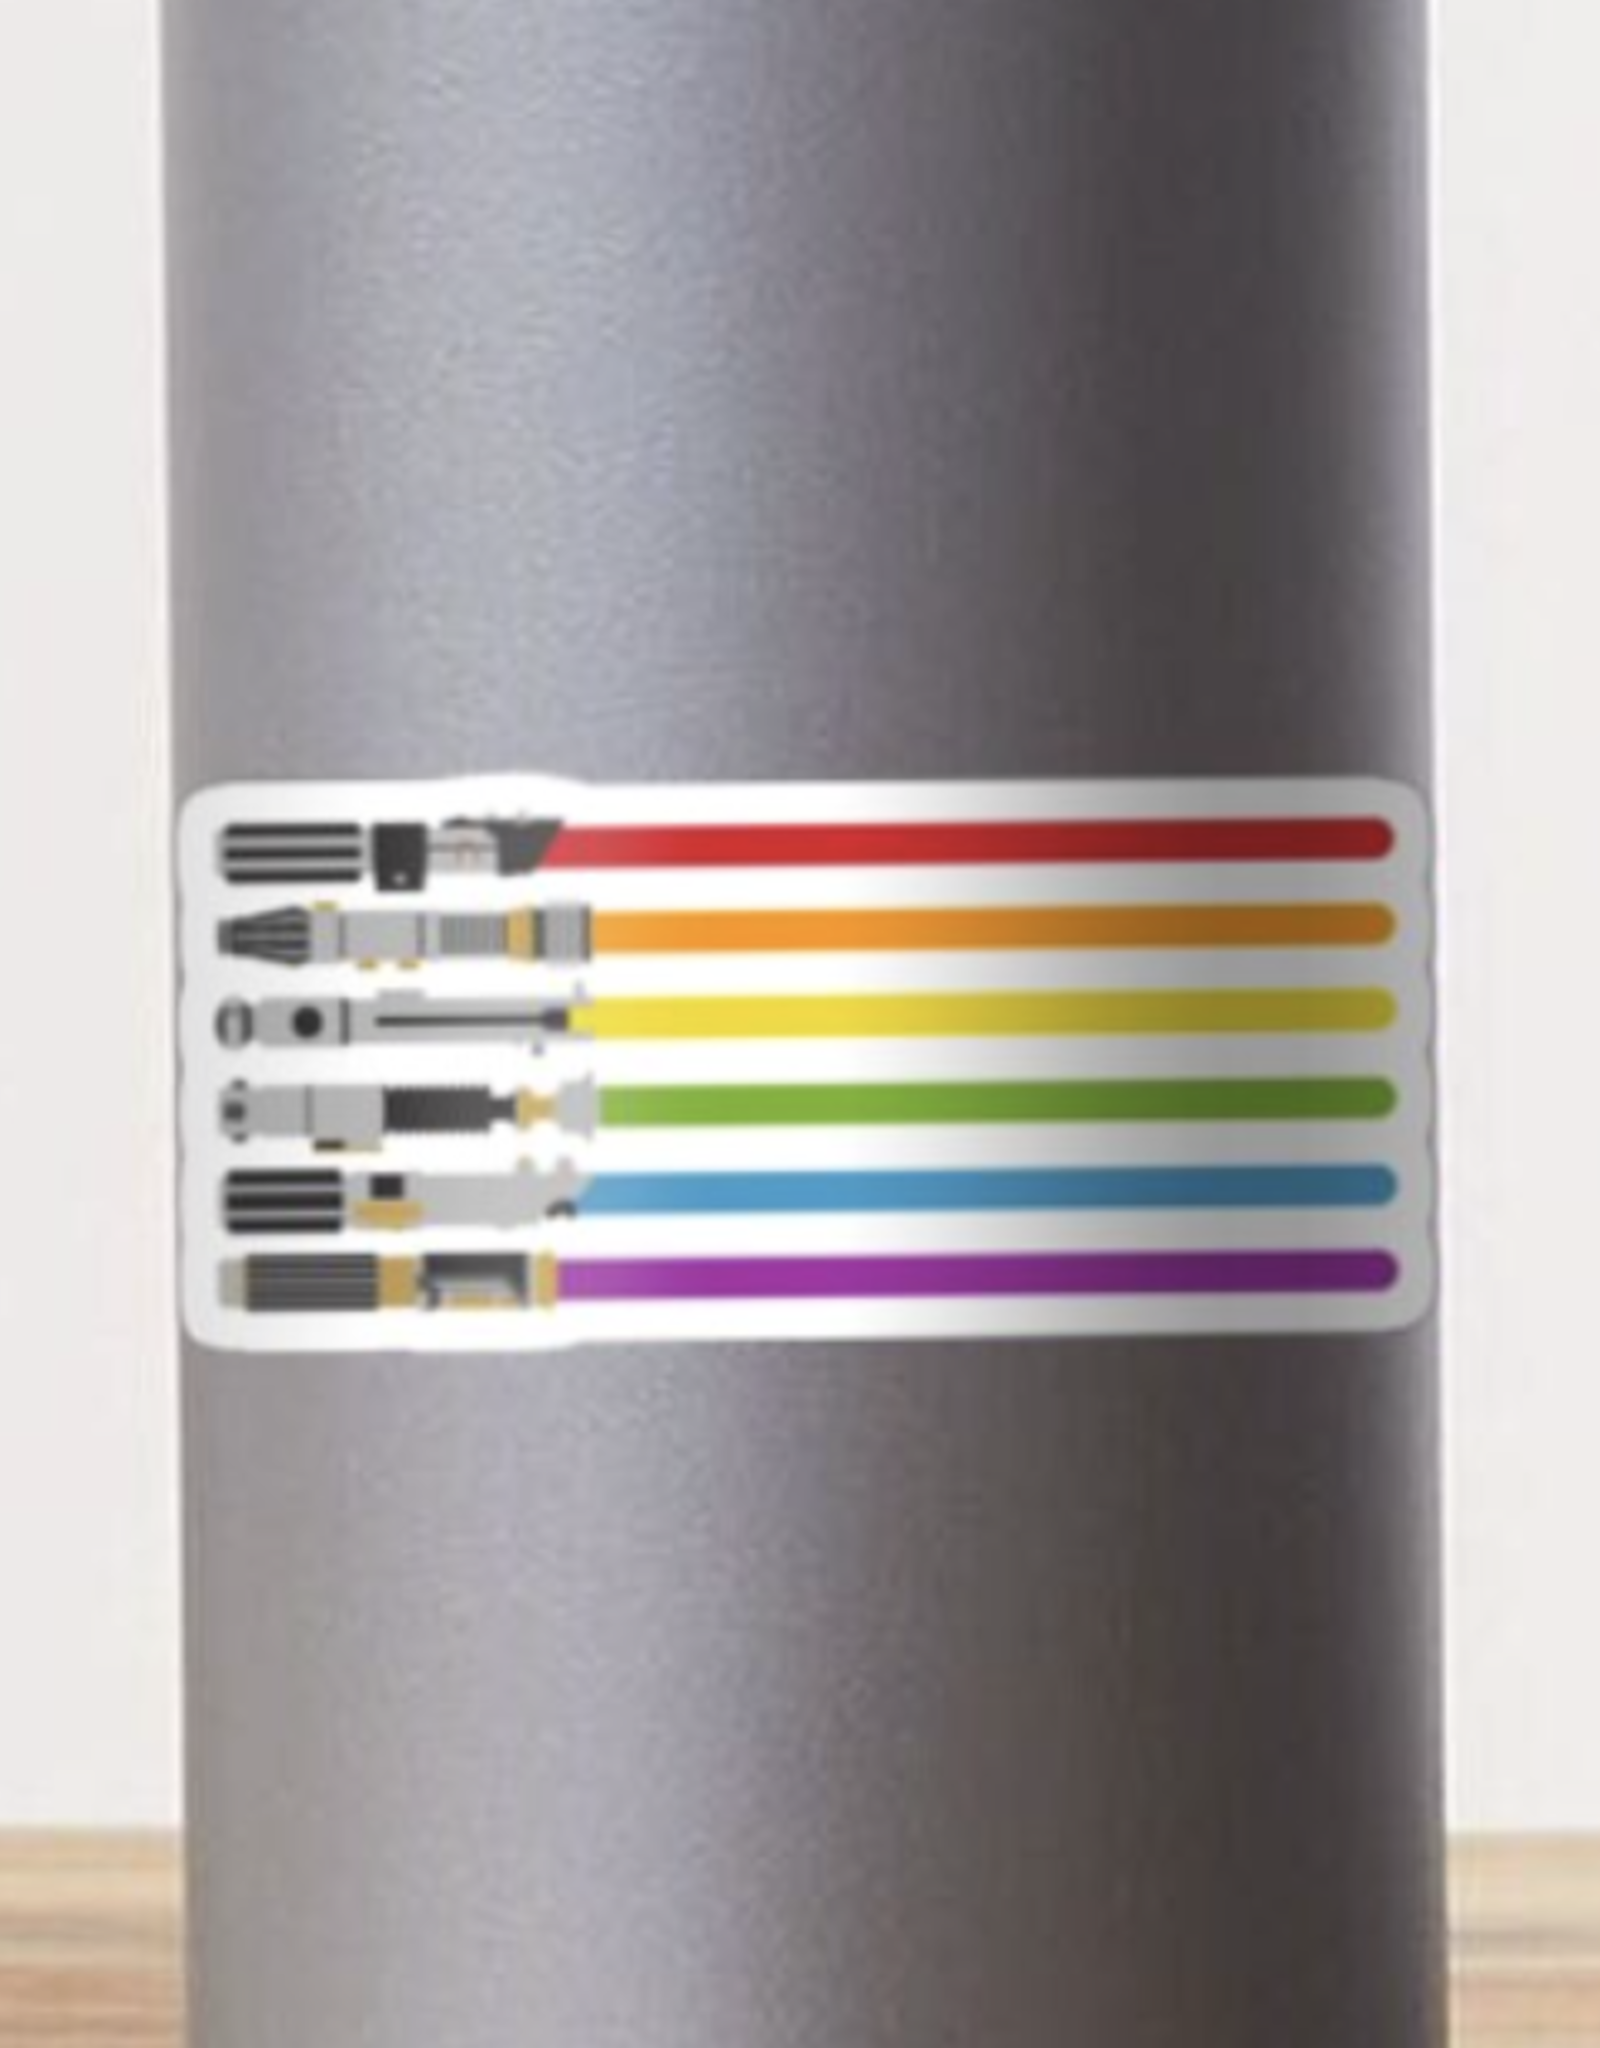 Lightsaber Rainbow Sticker